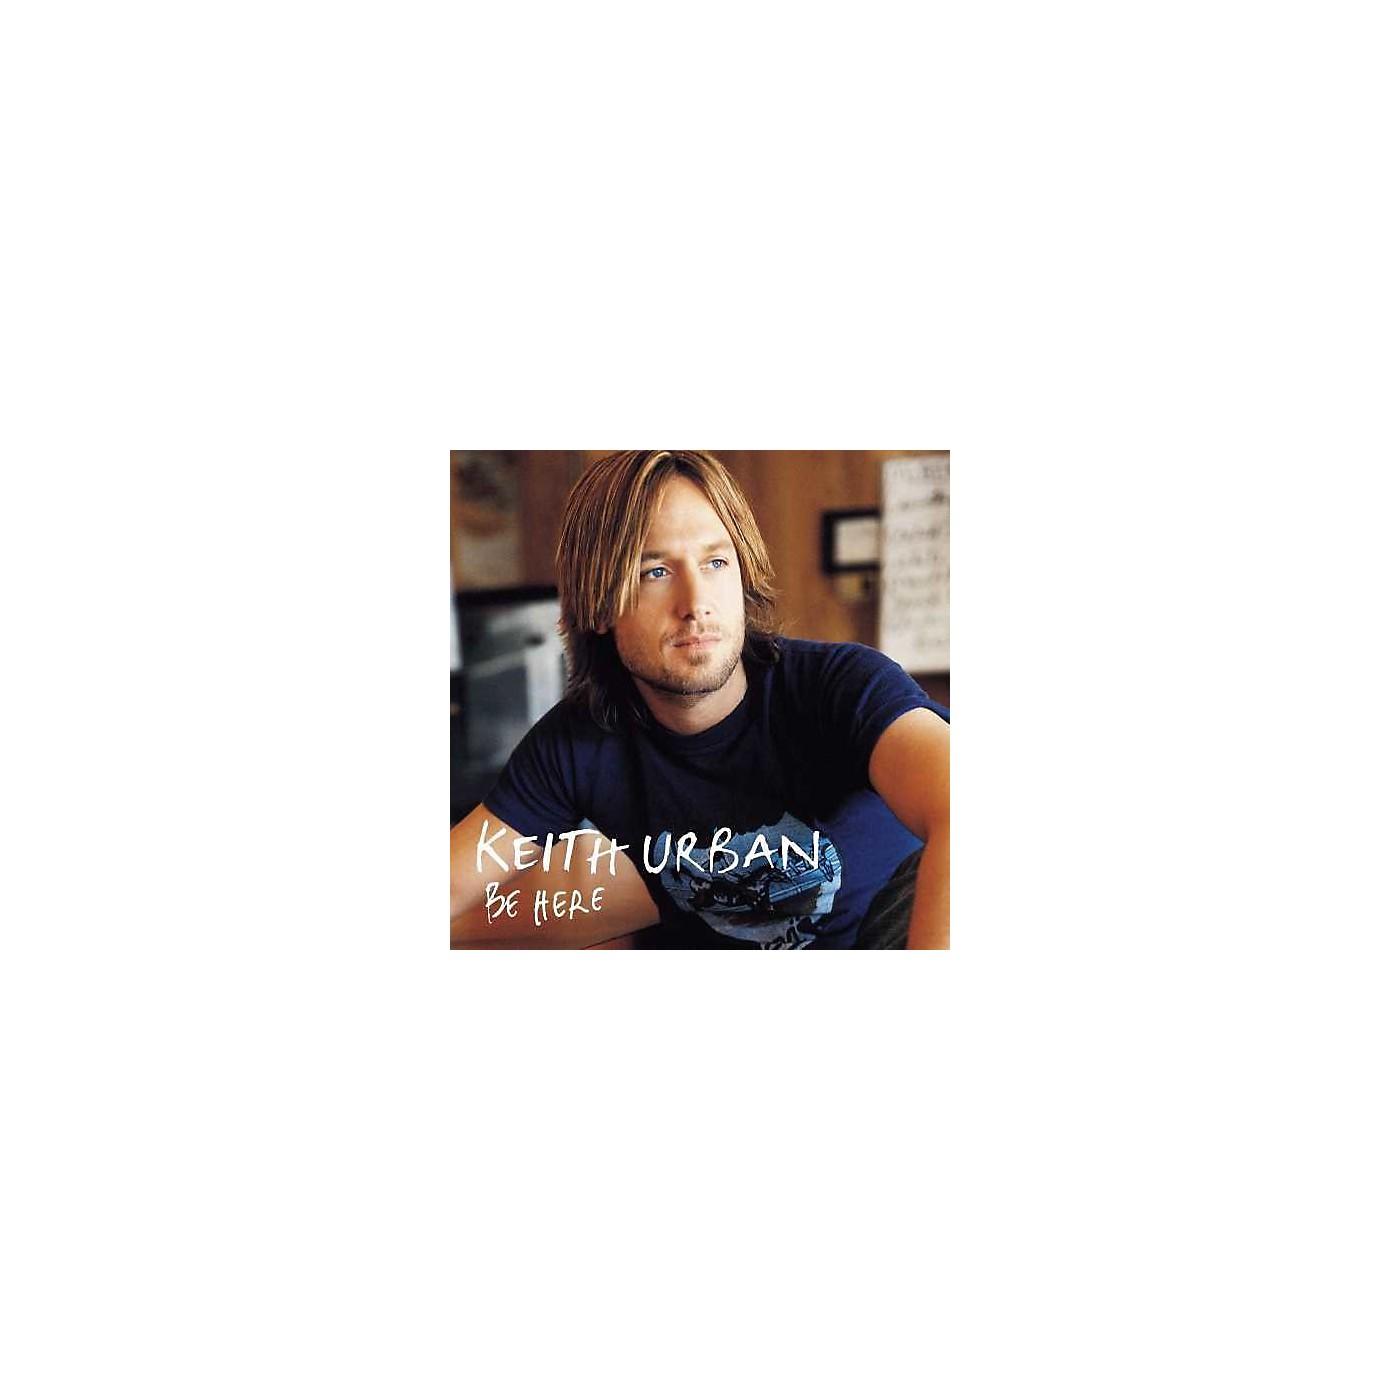 Alliance Keith Urban - Be Here thumbnail